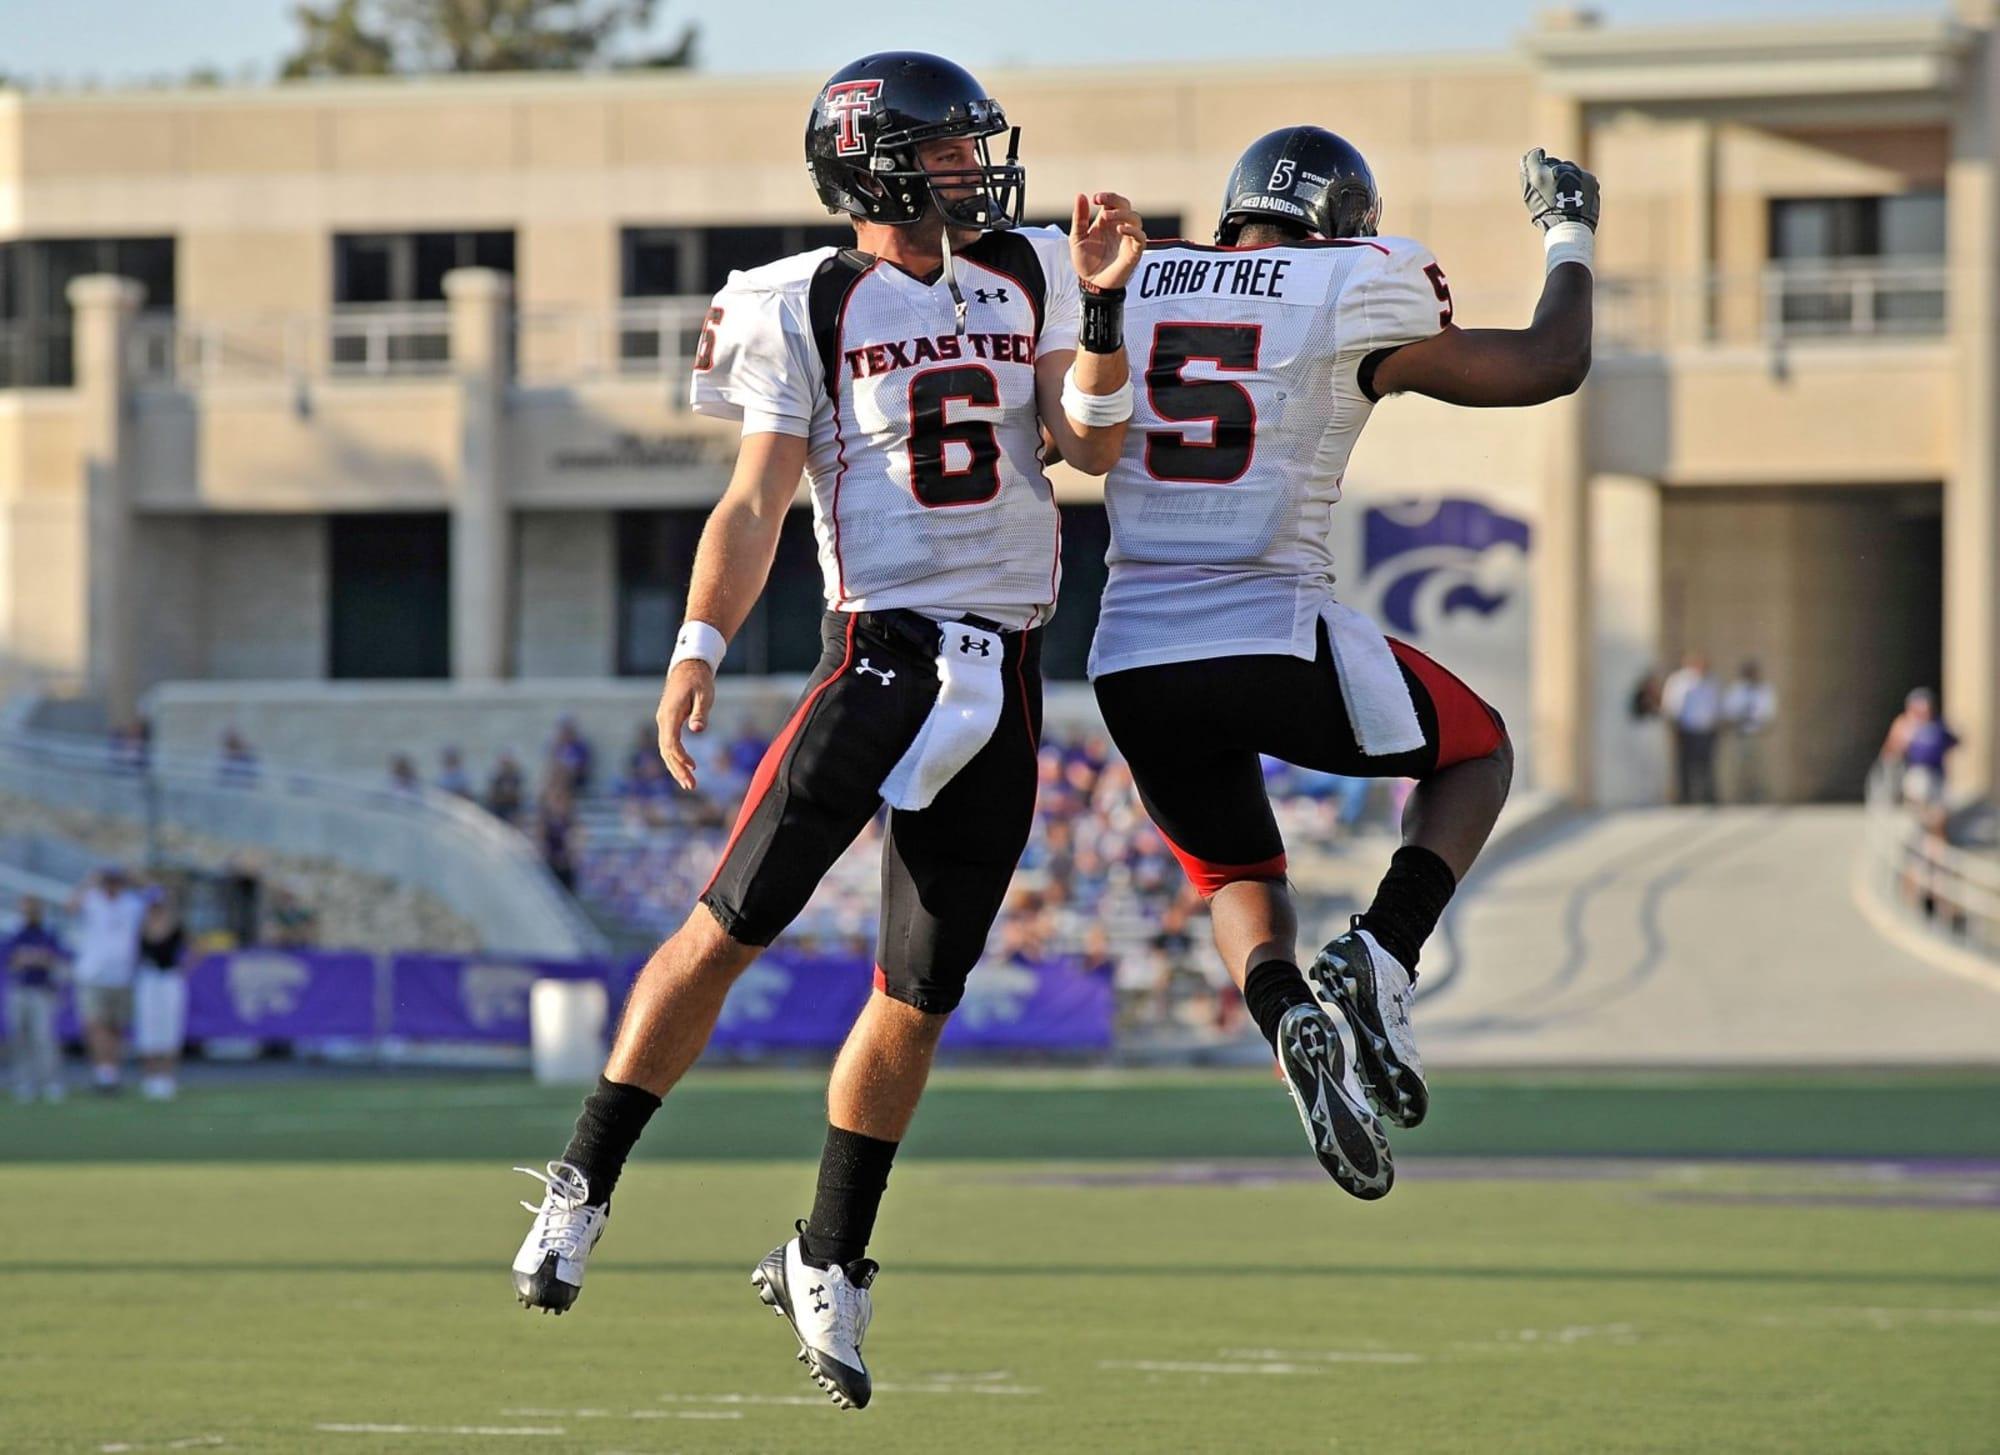 Texas Tech football: Harrell; Crabtree selected to Texas Tech Hall ...